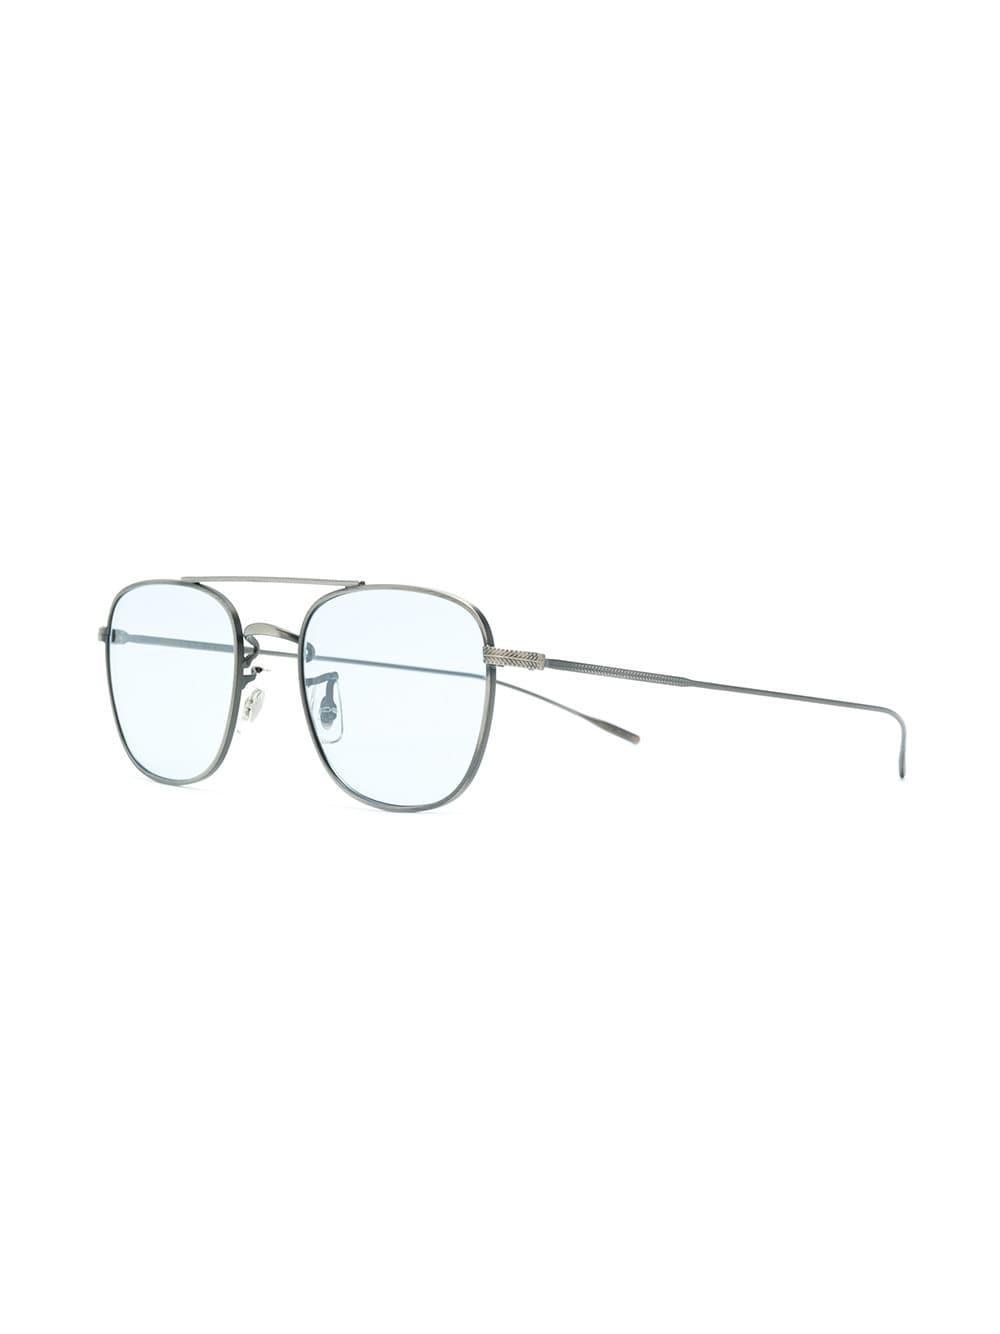 278a824aaf7 Oliver Peoples Kress Square Glasses in Metallic for Men - Lyst